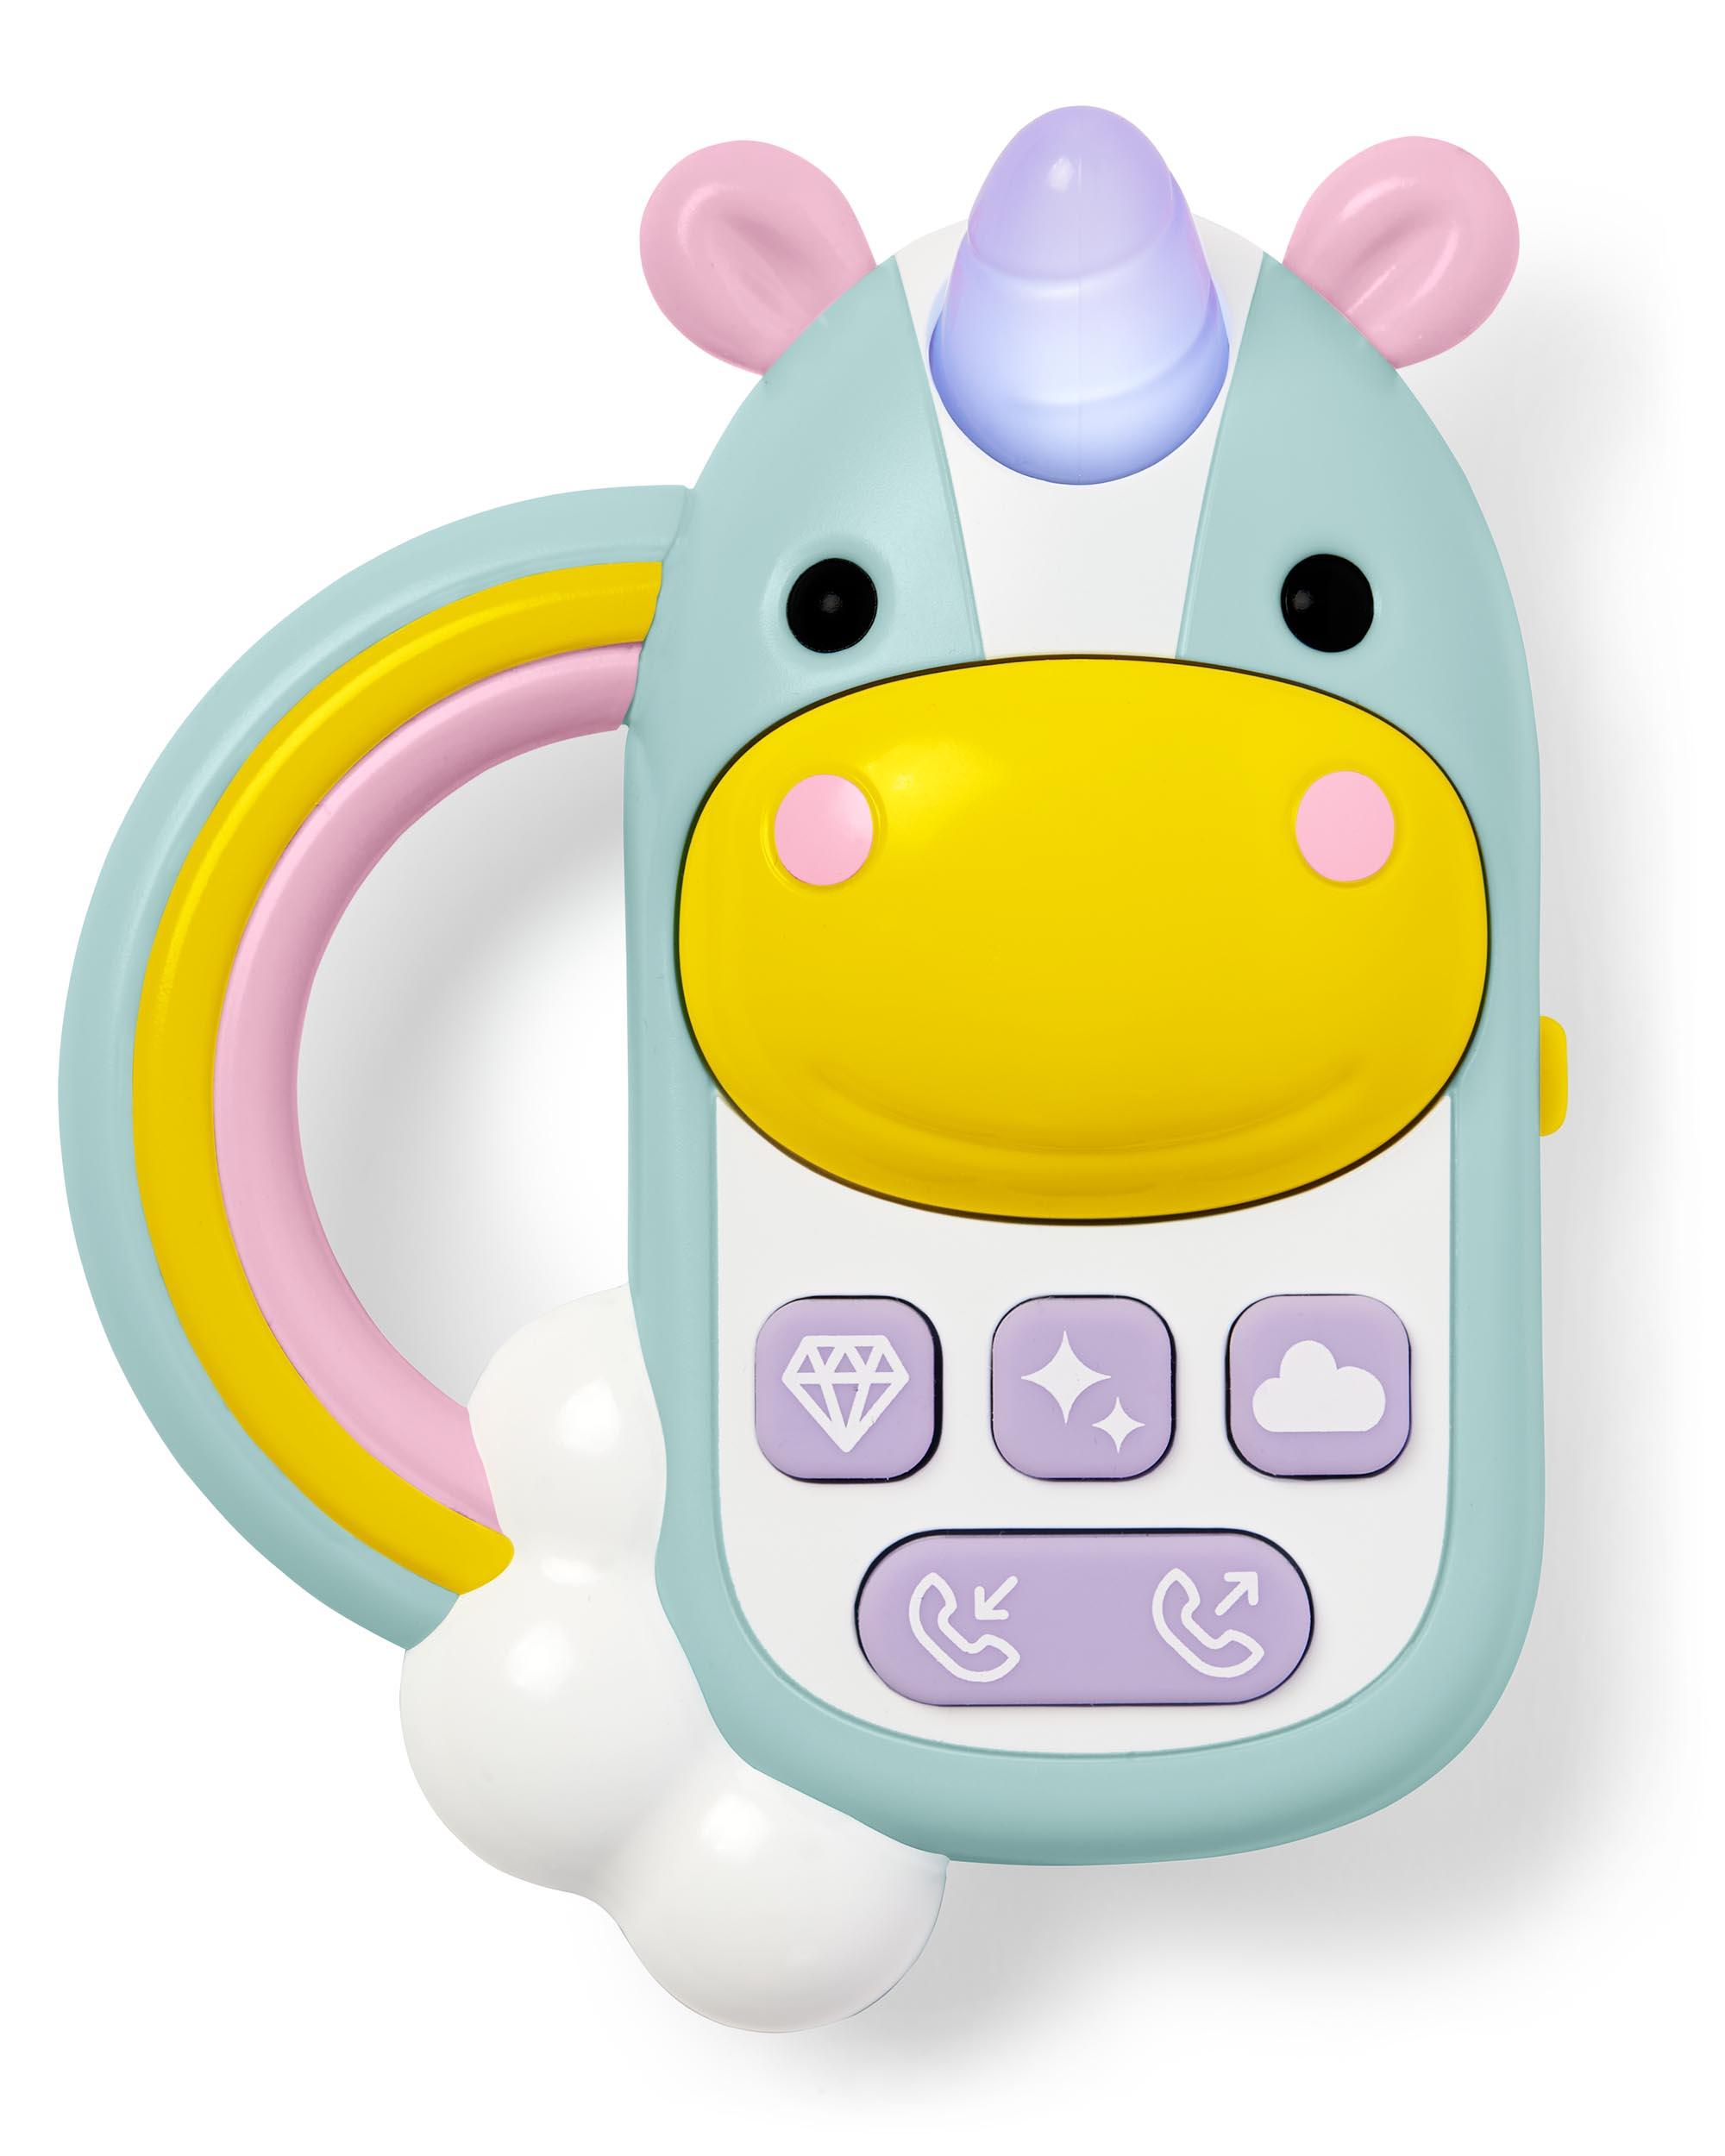 Skip hop logo clipart stock Zoo Unicorn Phone   skiphop.com stock